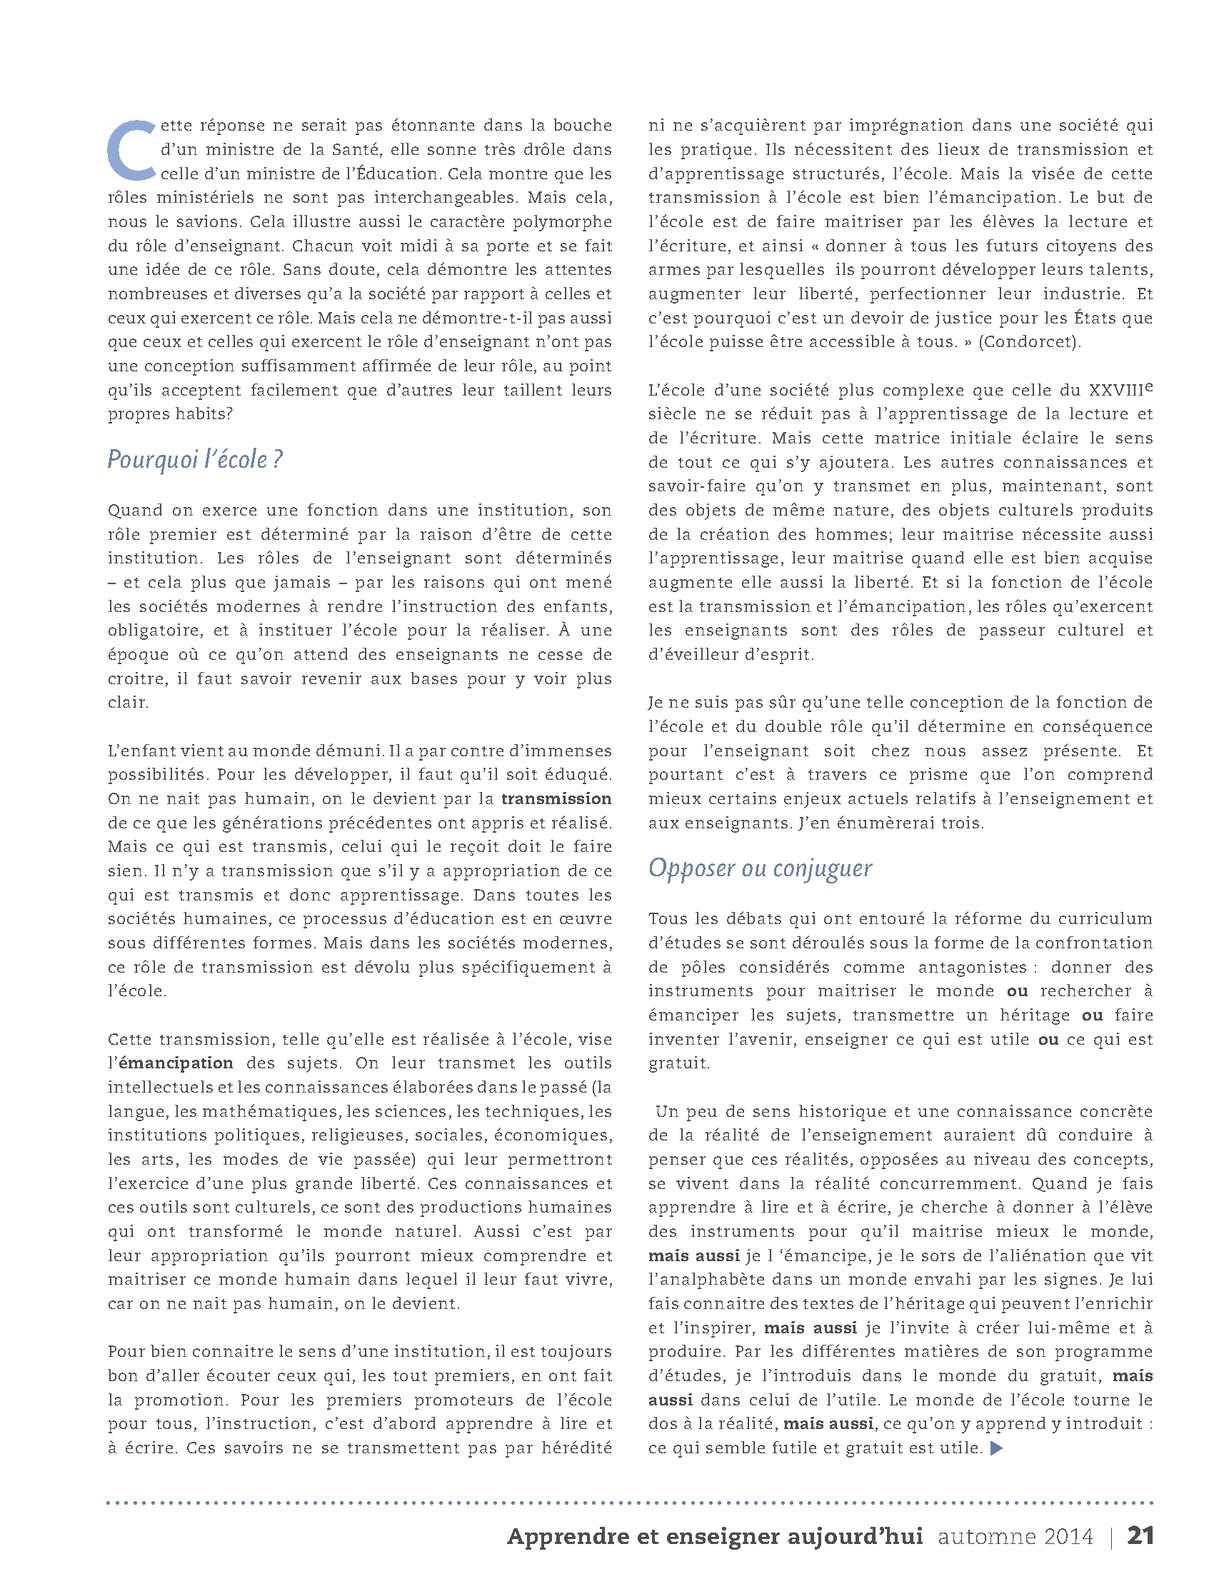 Apprendre Et Enseigner Aujourd Hui Vol 4 No 1 Calameo Downloader